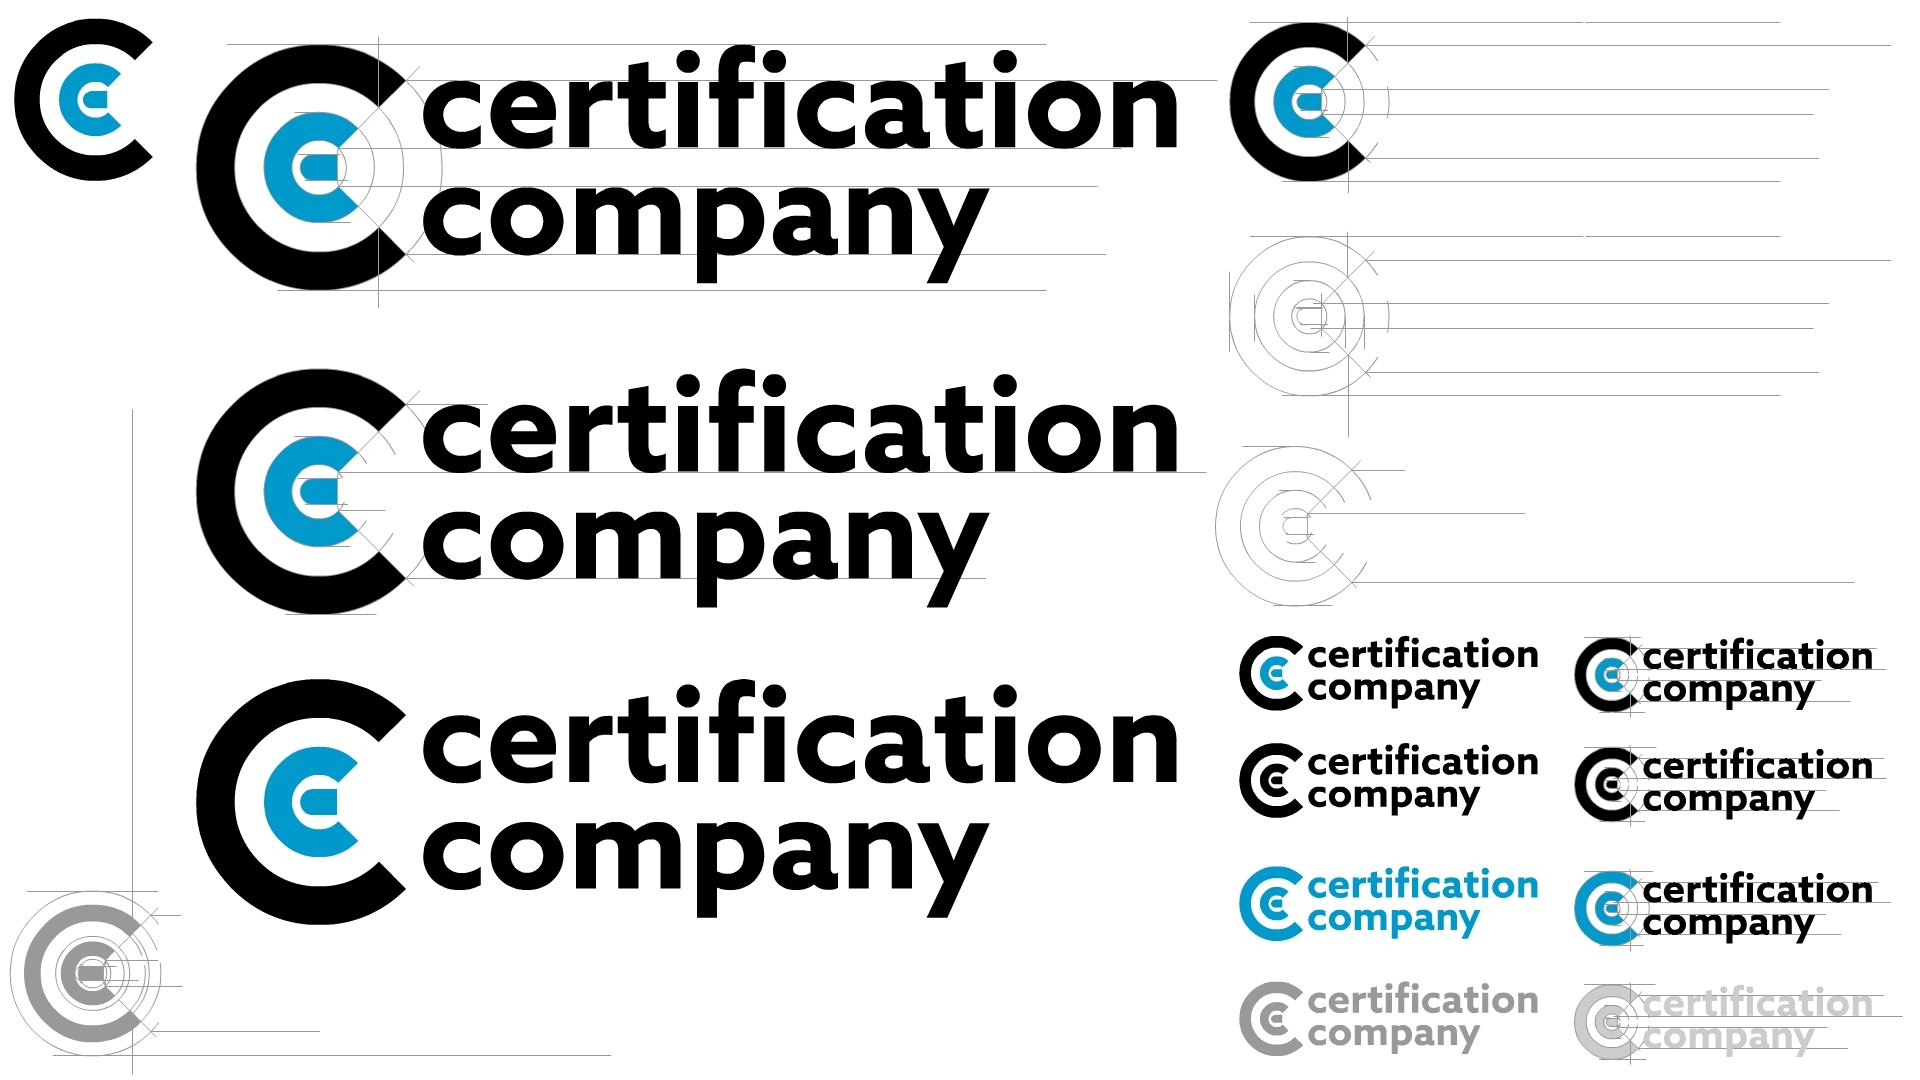 CC_logos_ALL